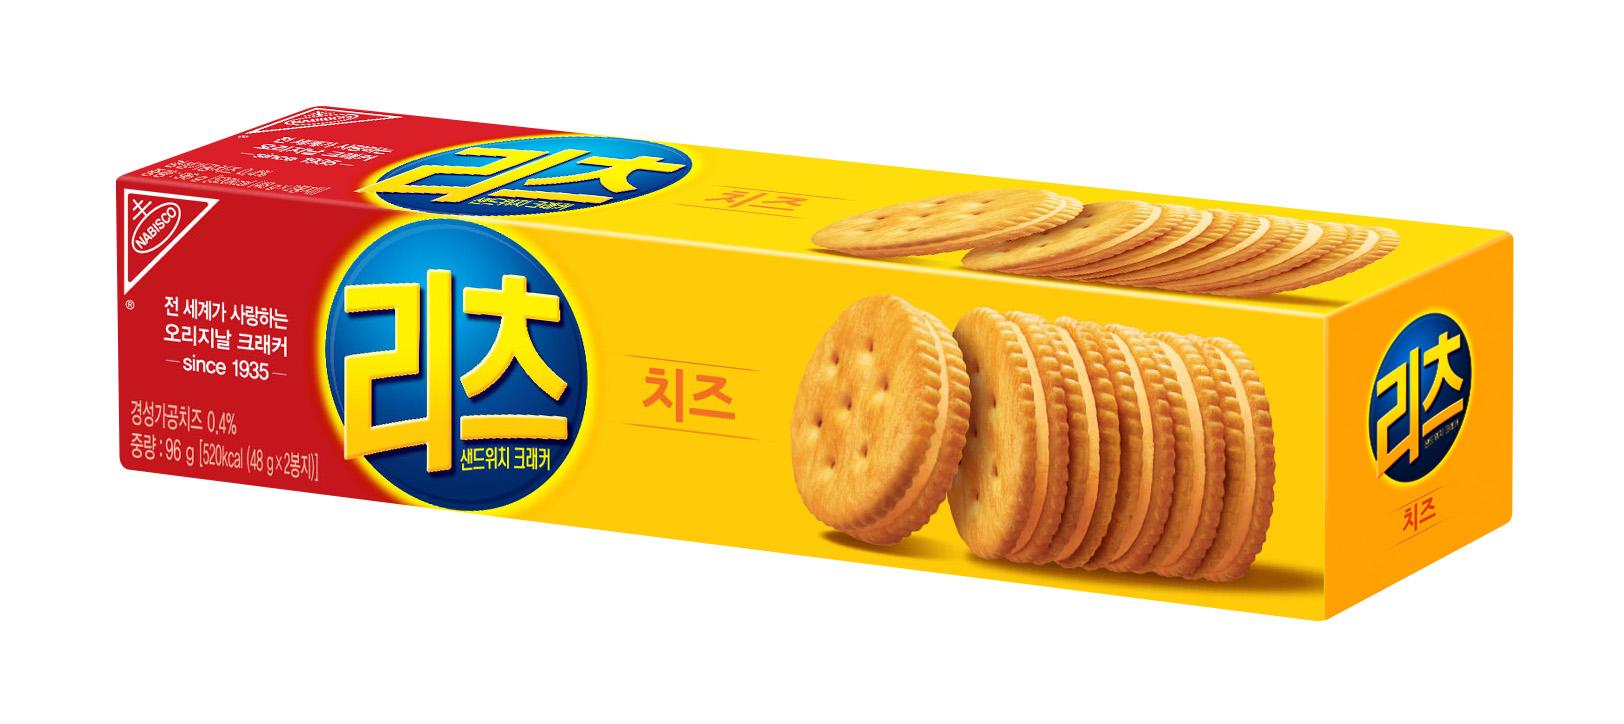 nabisco ritz cracker cheese sand 96g end 8 30 2020 3 52 pm